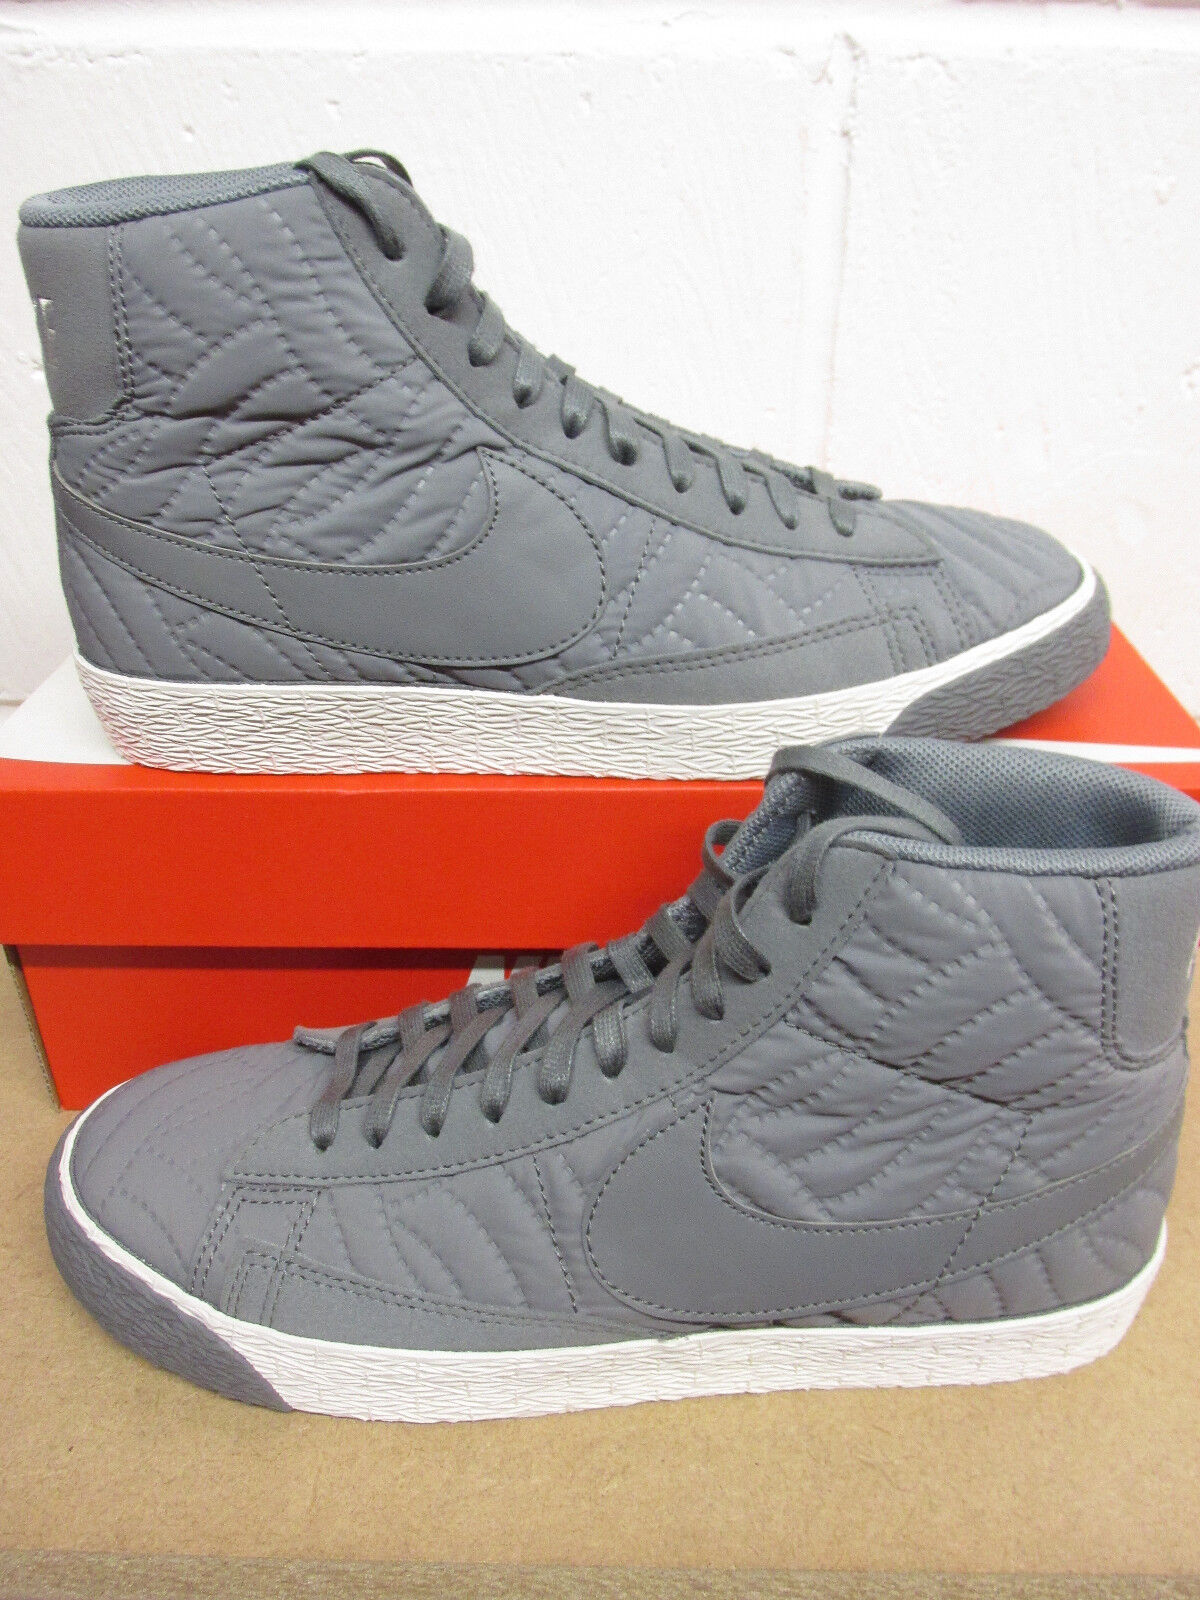 Nike Womens Blazer Mid PRM SE Hi Top Trainers 857664 857664 857664 002 Sneakers shoes ec8622